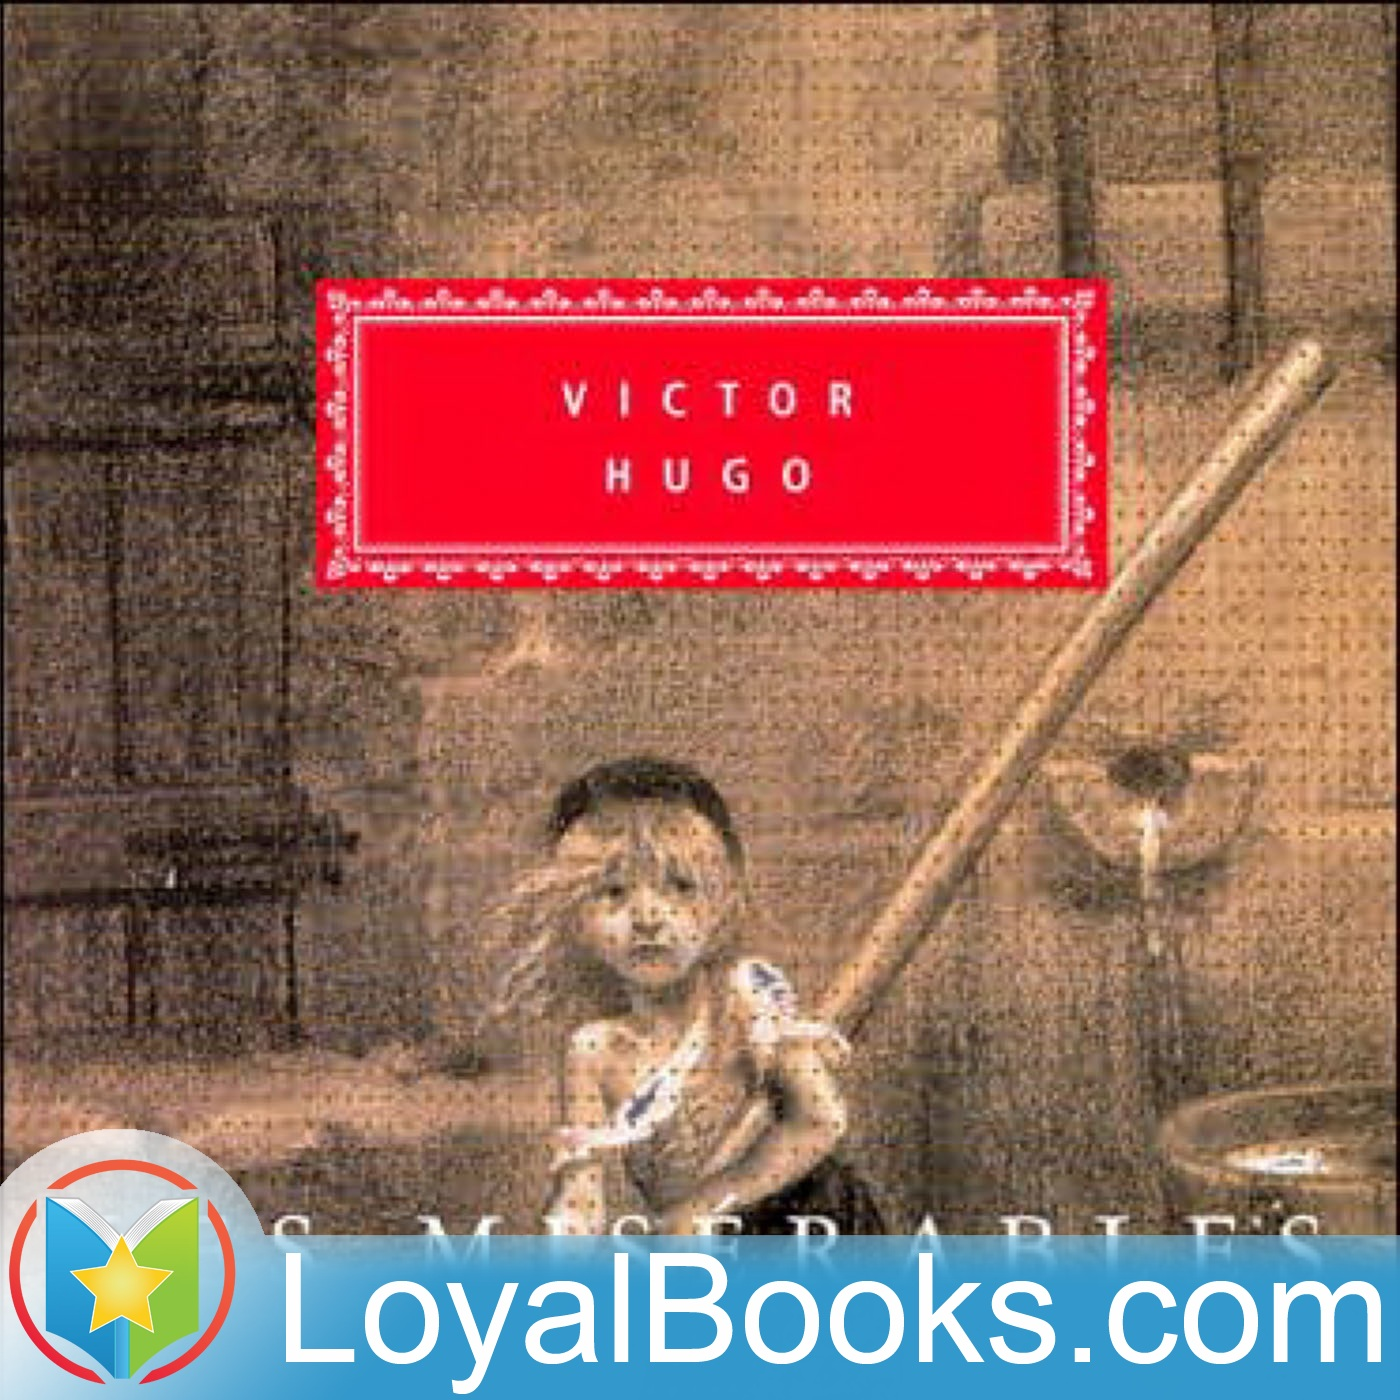 <![CDATA[Les Misérables by Victor Hugo]]>